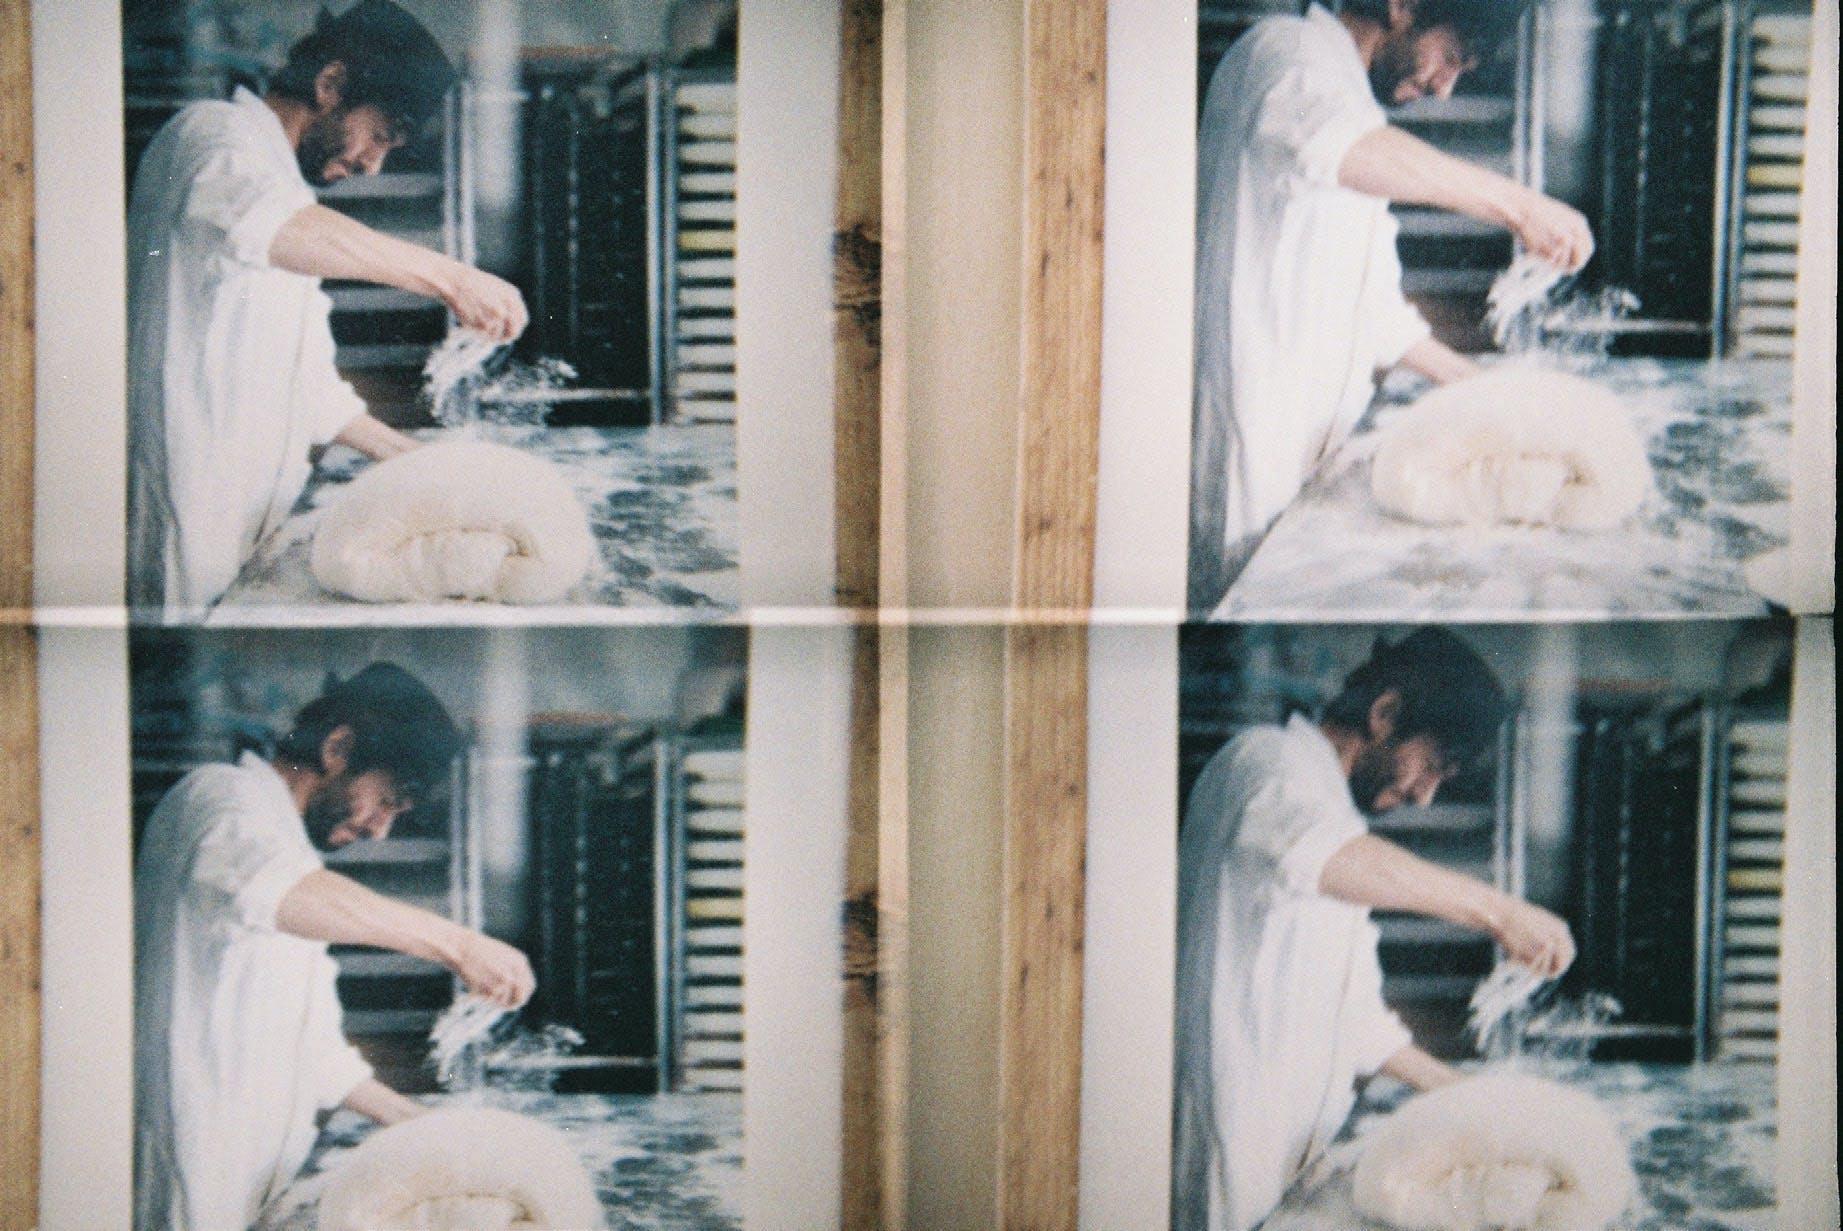 Matthew Jones, Founder at Bread Ahead, Baking